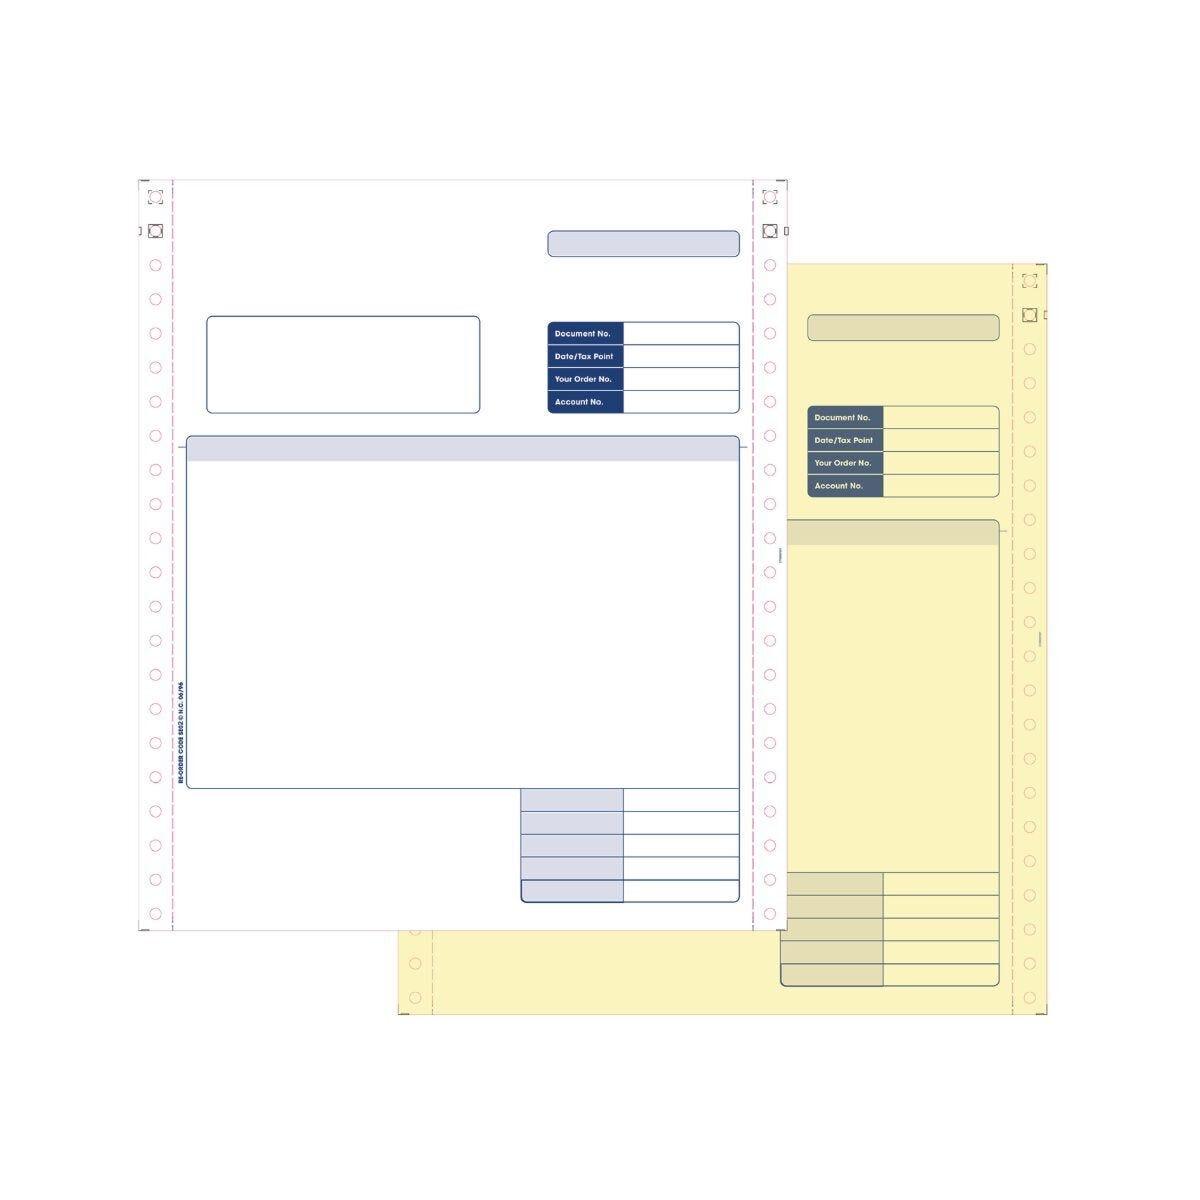 Custom Form Sage Compatible 2-Part Invoice for Dot Matrix Printers Pack of 1000